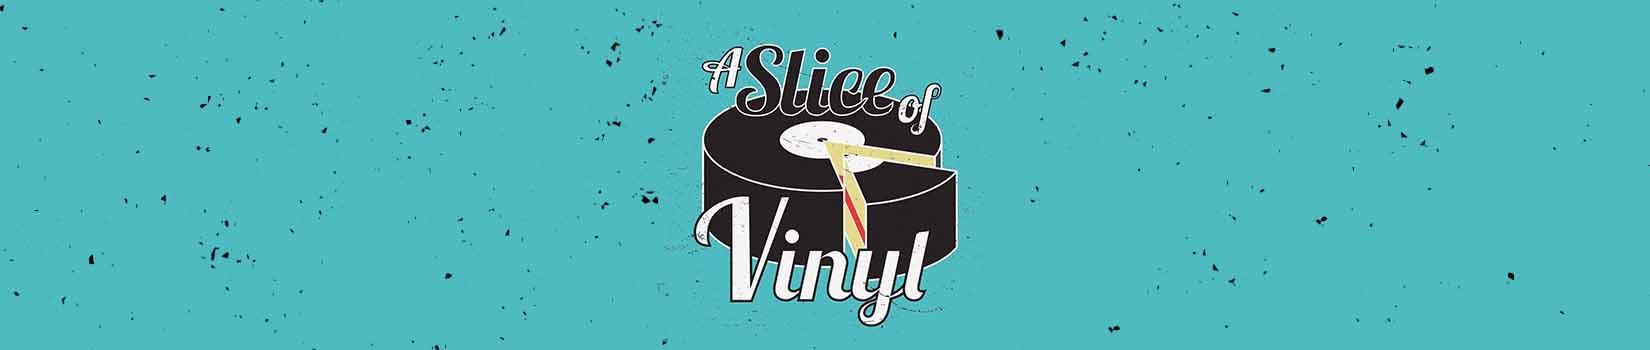 A Slice of Vinyl